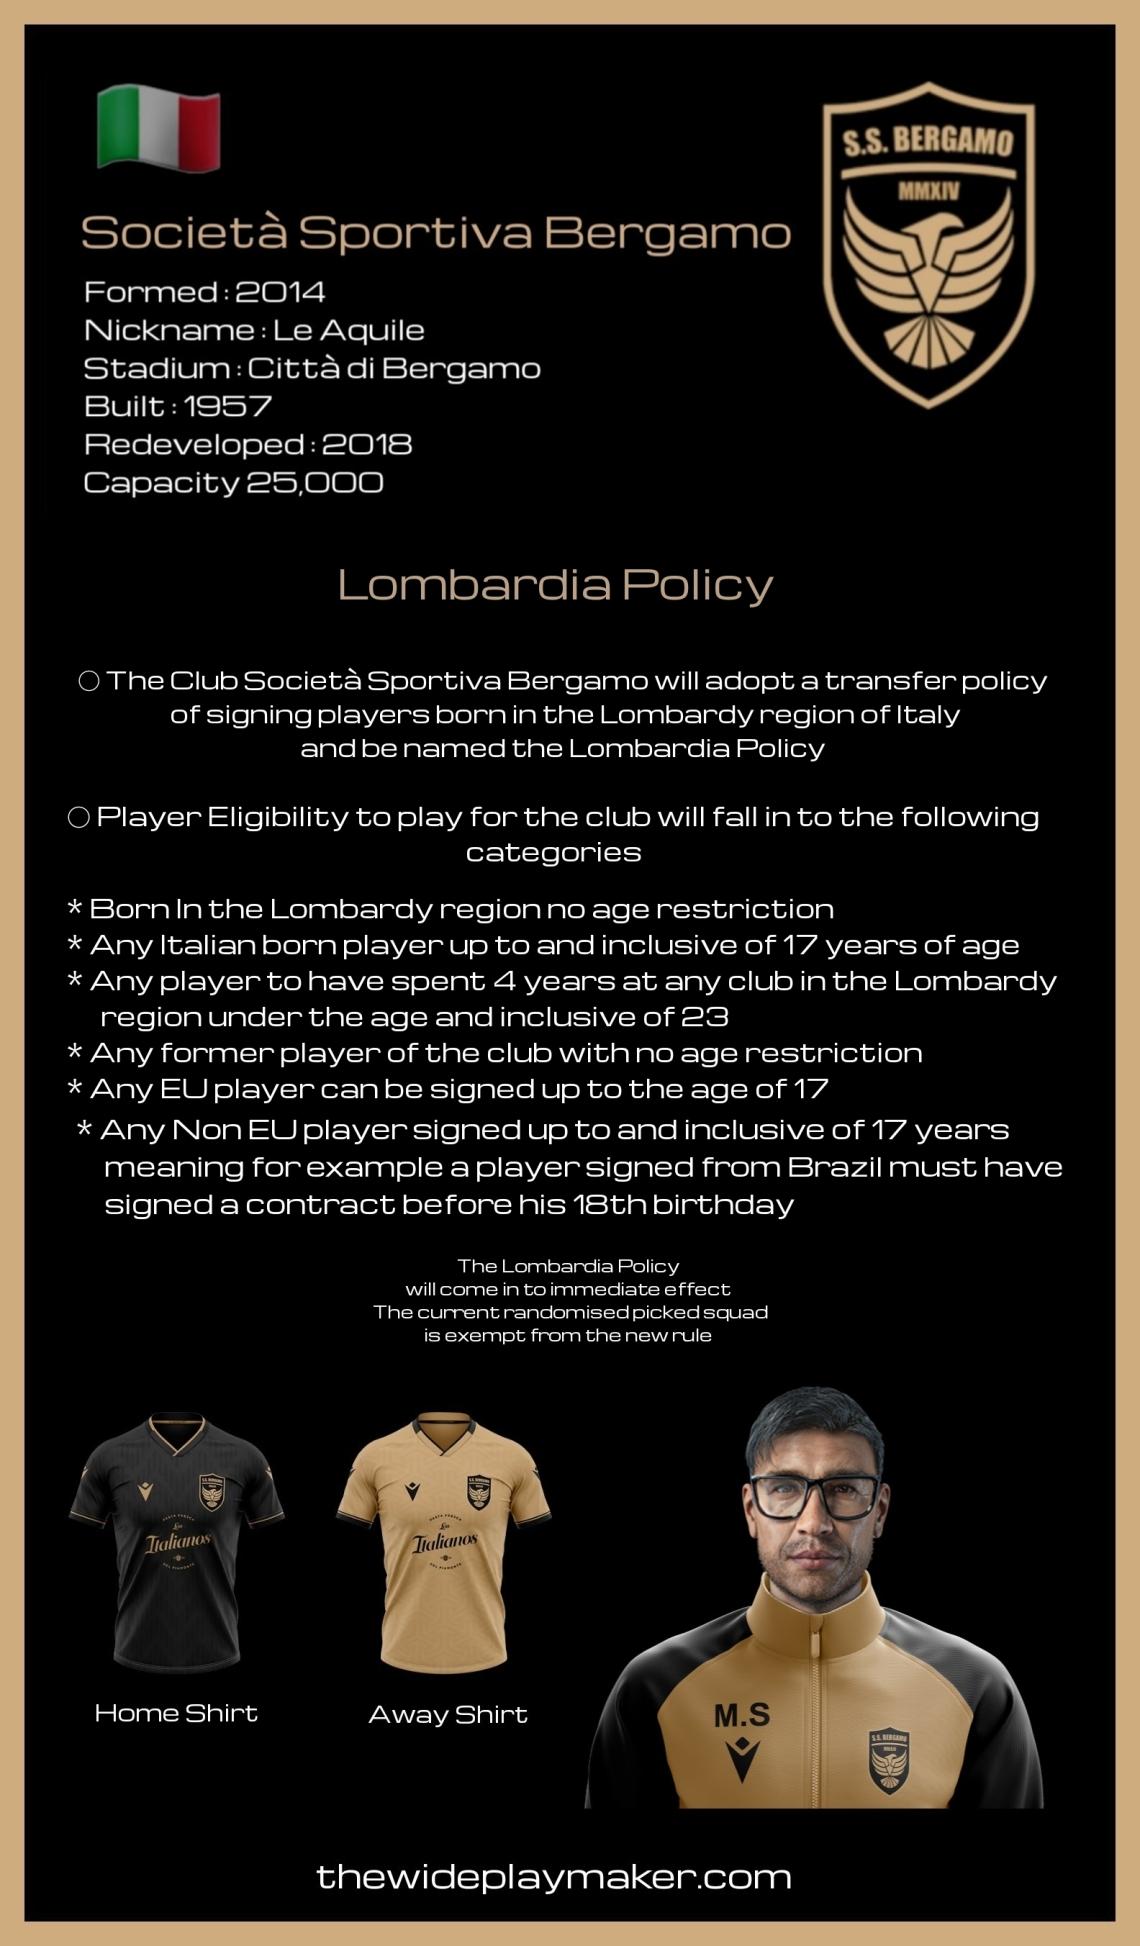 Lombardia policy